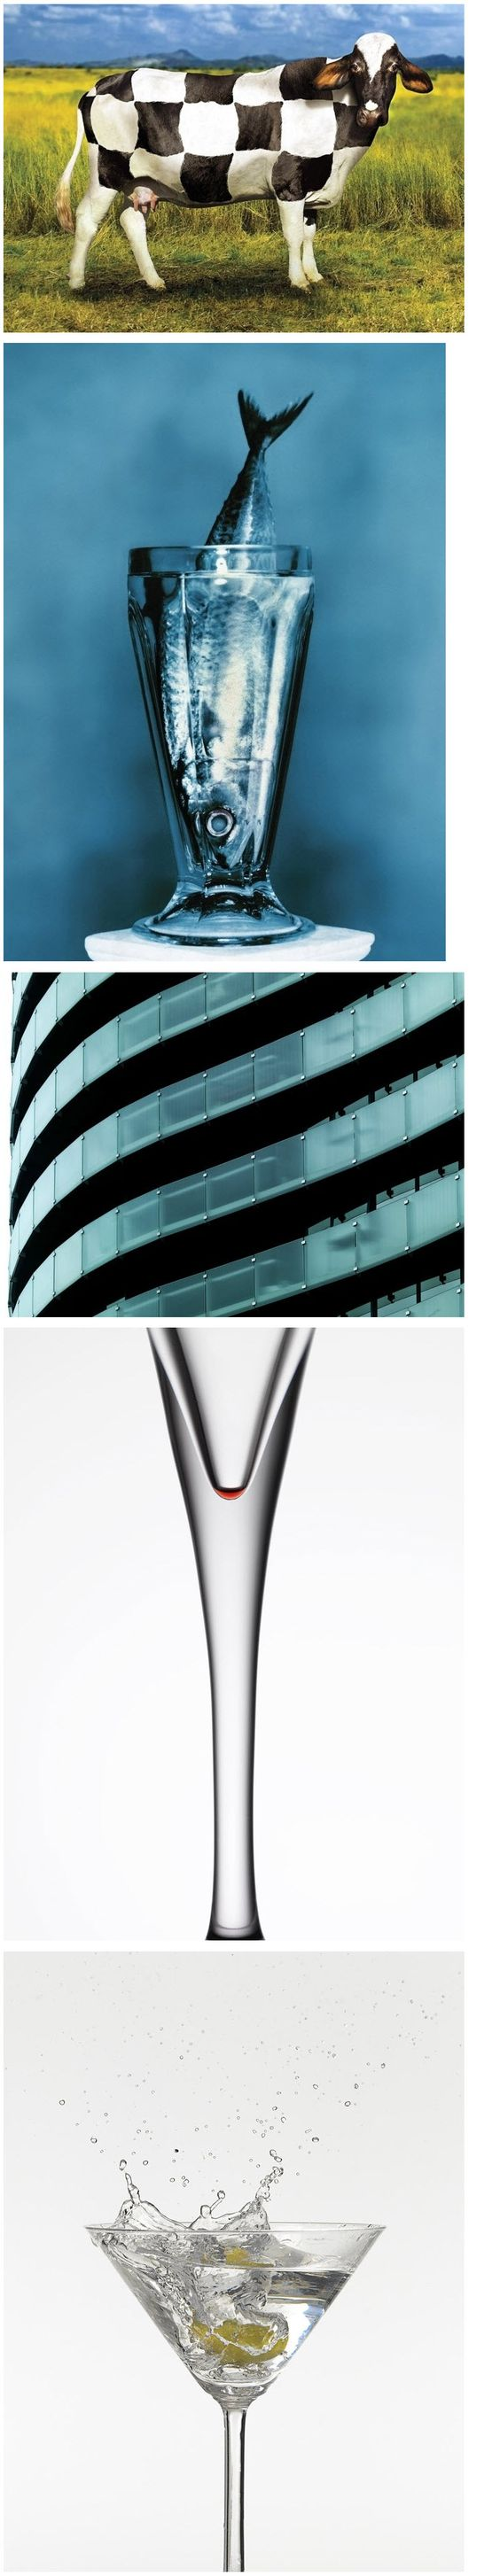 Mauro Risch Photography | Warning: Graphic Design | Pinterest ...